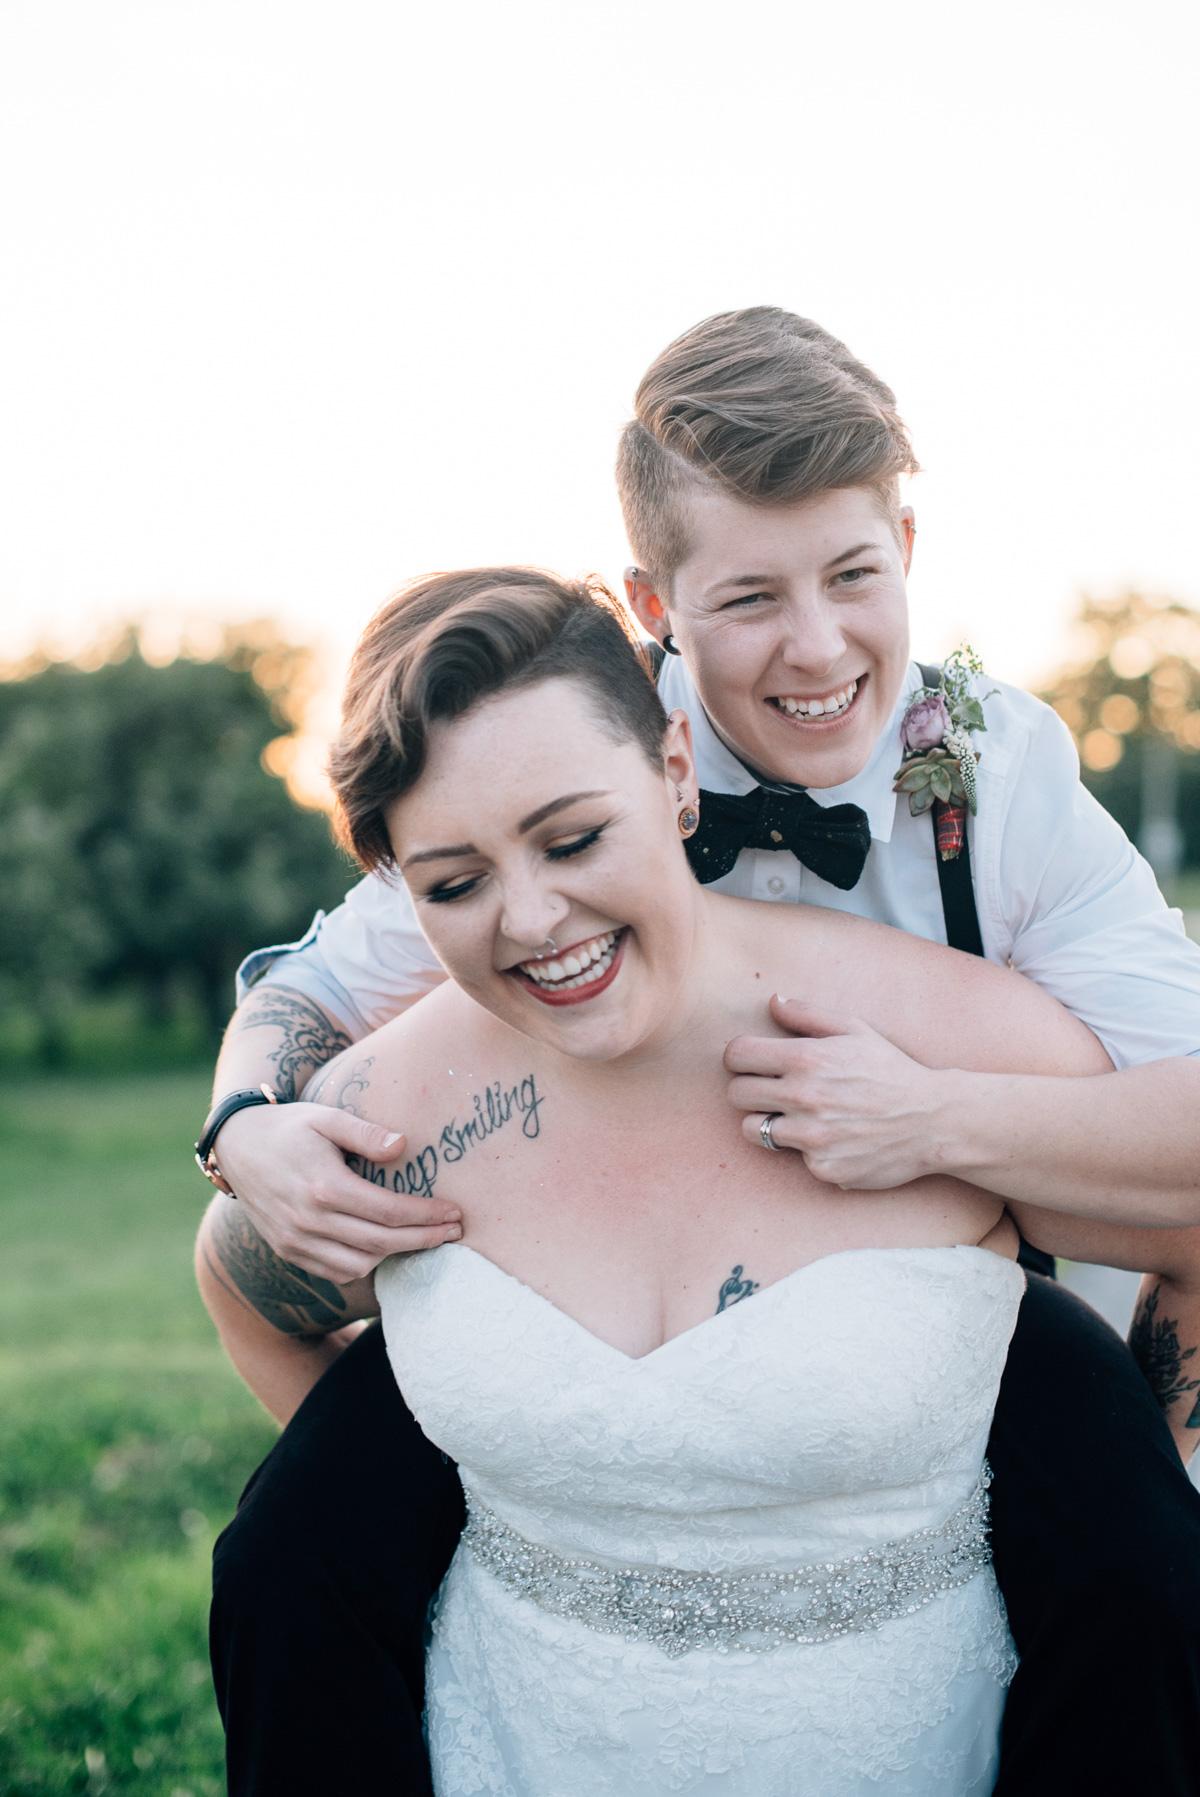 sara-wilde-photography-vineyard-bride-swish-list-beamer-falls-manor-grimsby-wedding-63.jpg